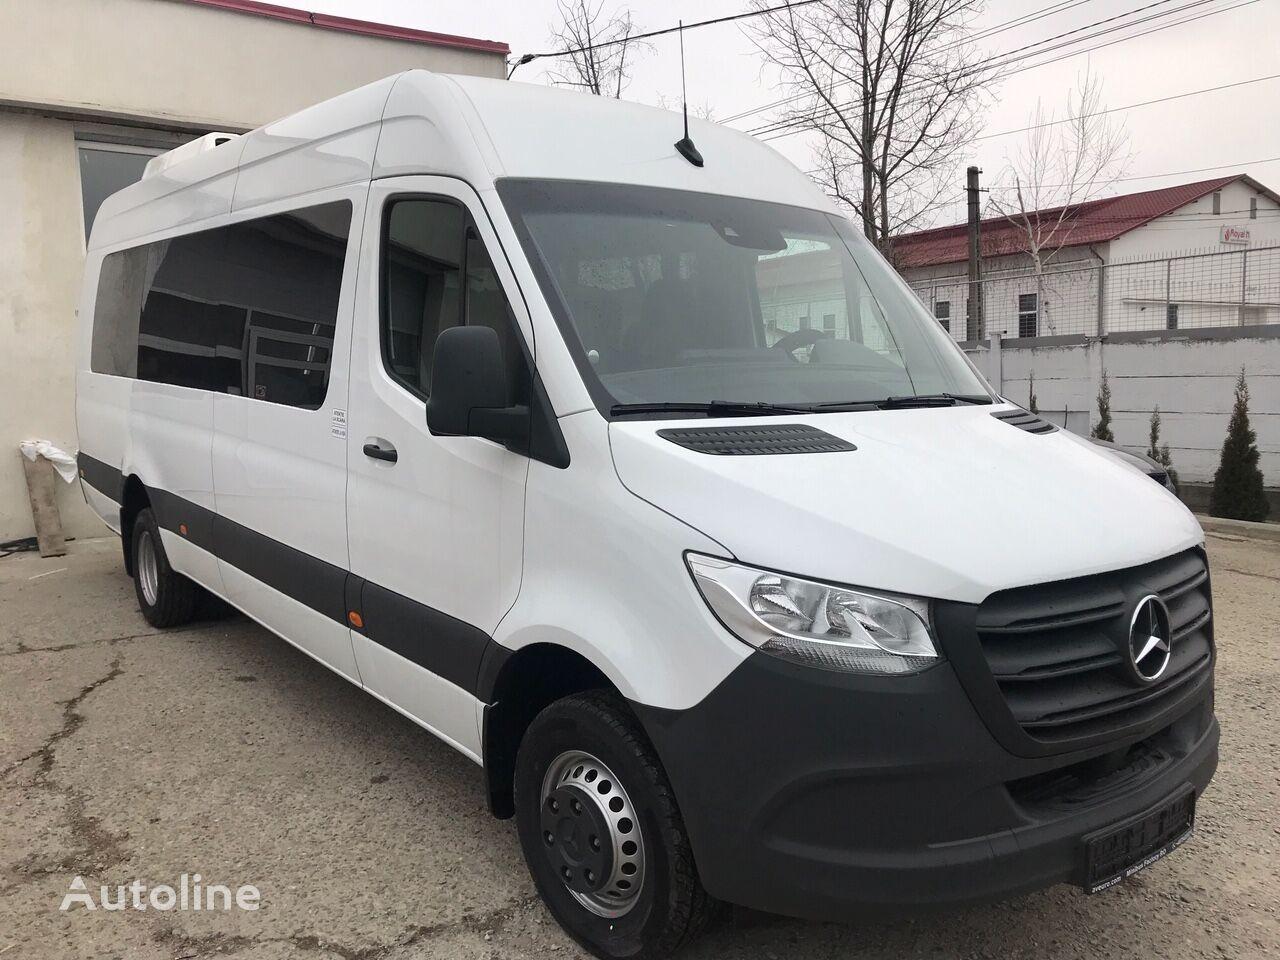 furgoneta de pasajeros MERCEDES-BENZ Sprinter 516 nueva